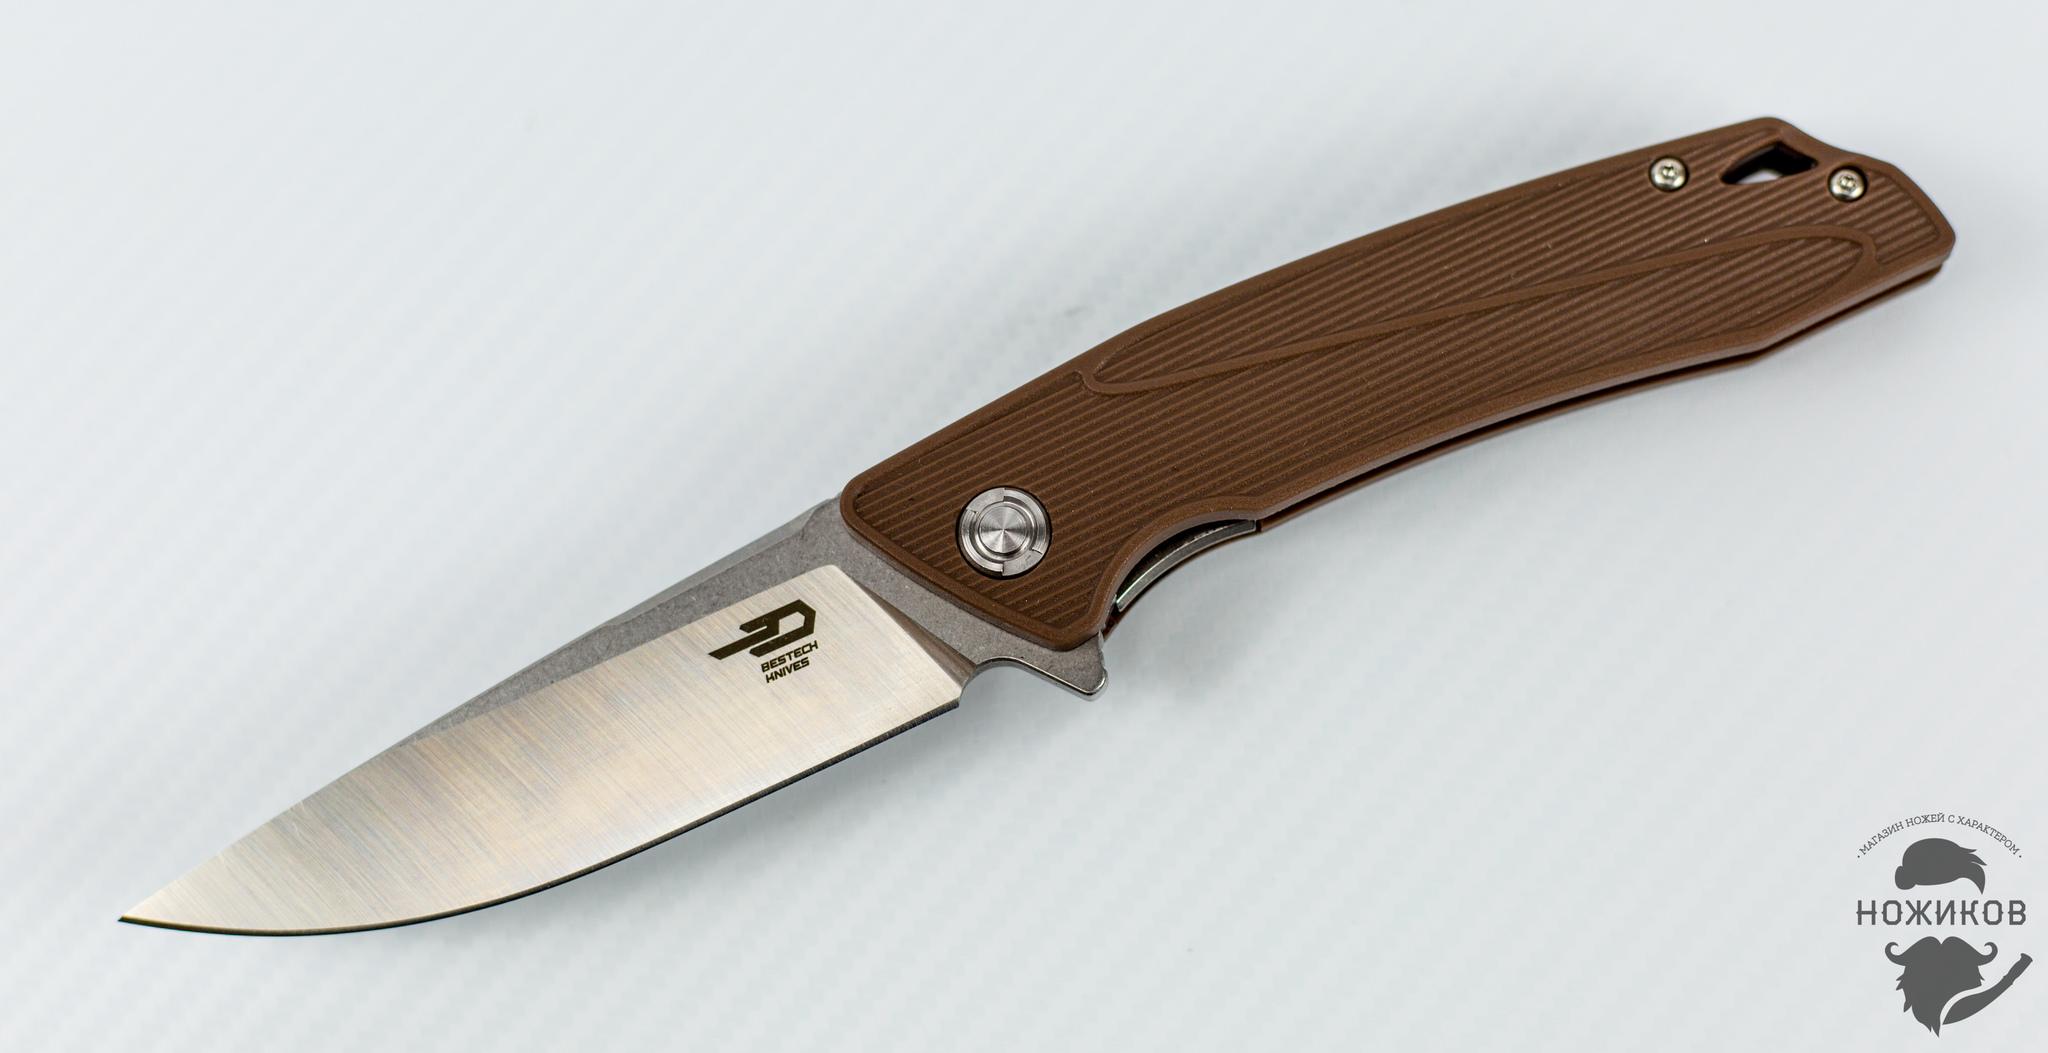 Складной нож Bestech Spike BG09C-2, сталь Sandvik 12C27 от Bestech Knives